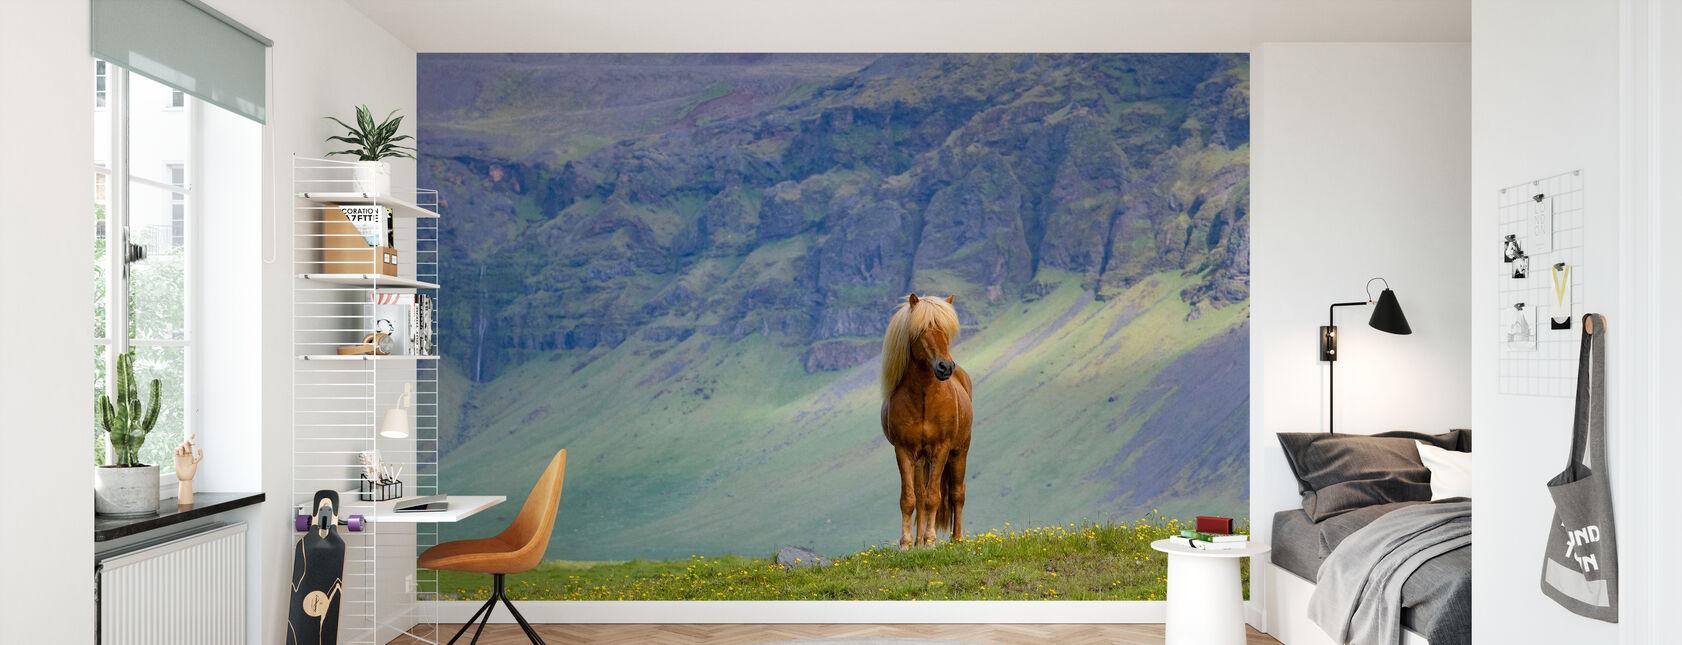 Horse in Grassland - Wallpaper - Kids Room